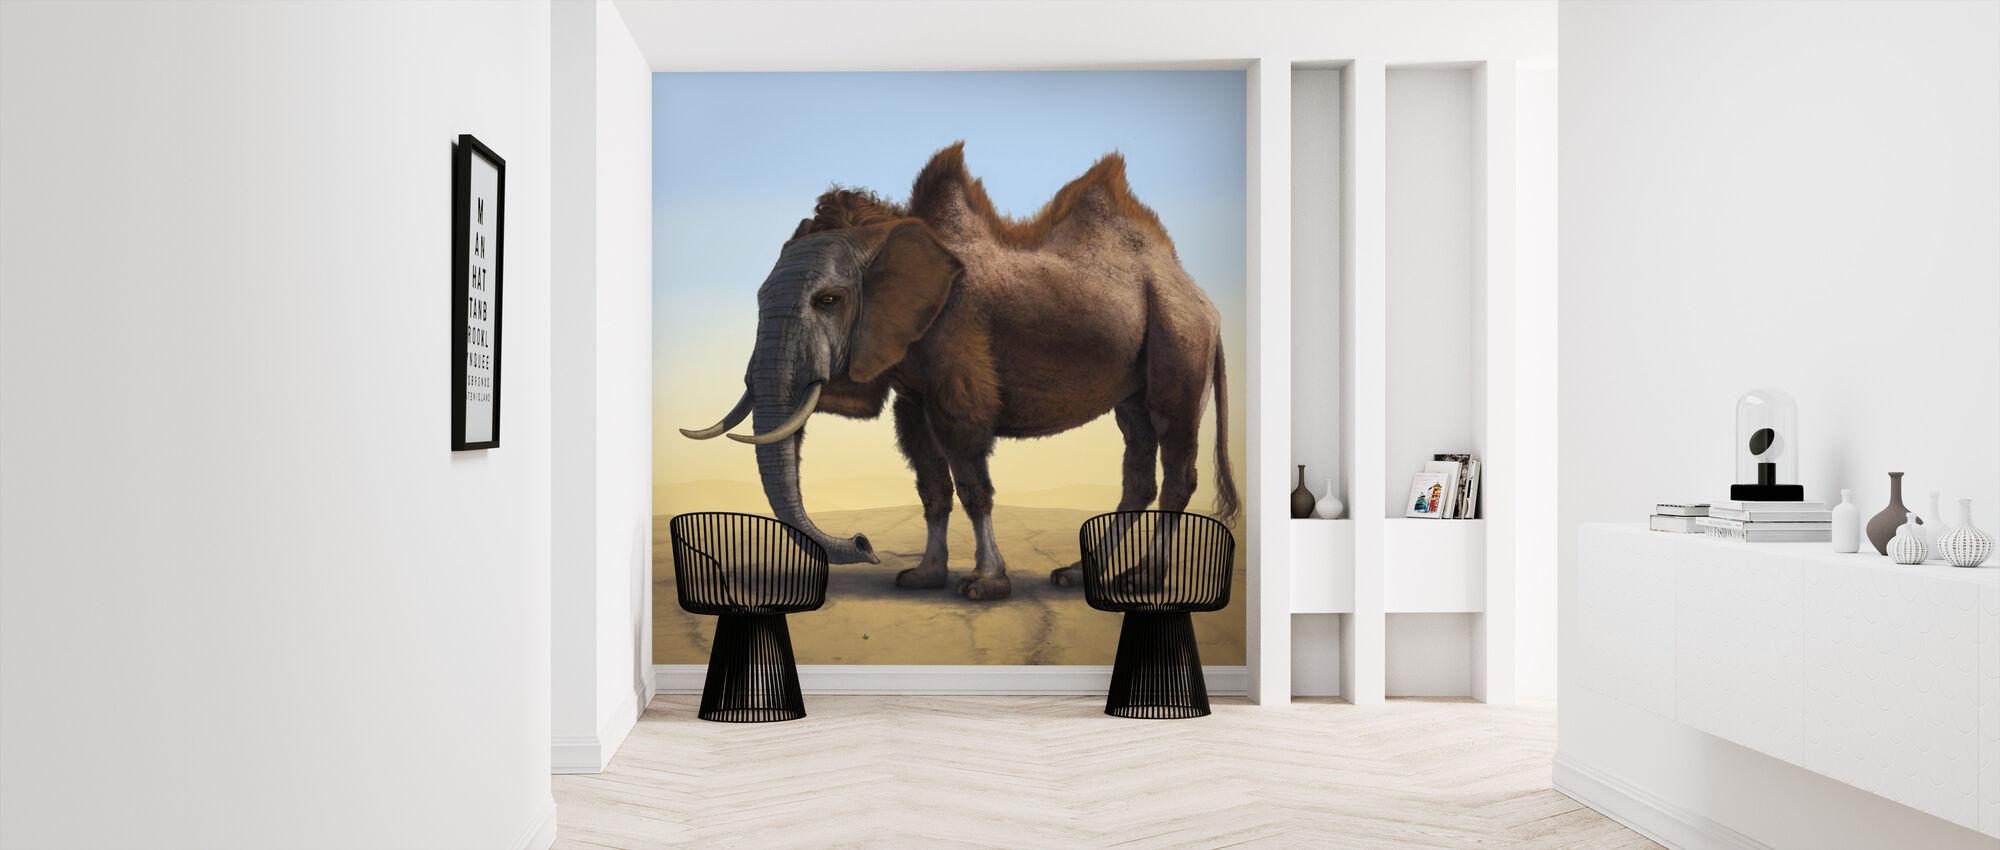 Kamelefantti - Tapetti - Aula